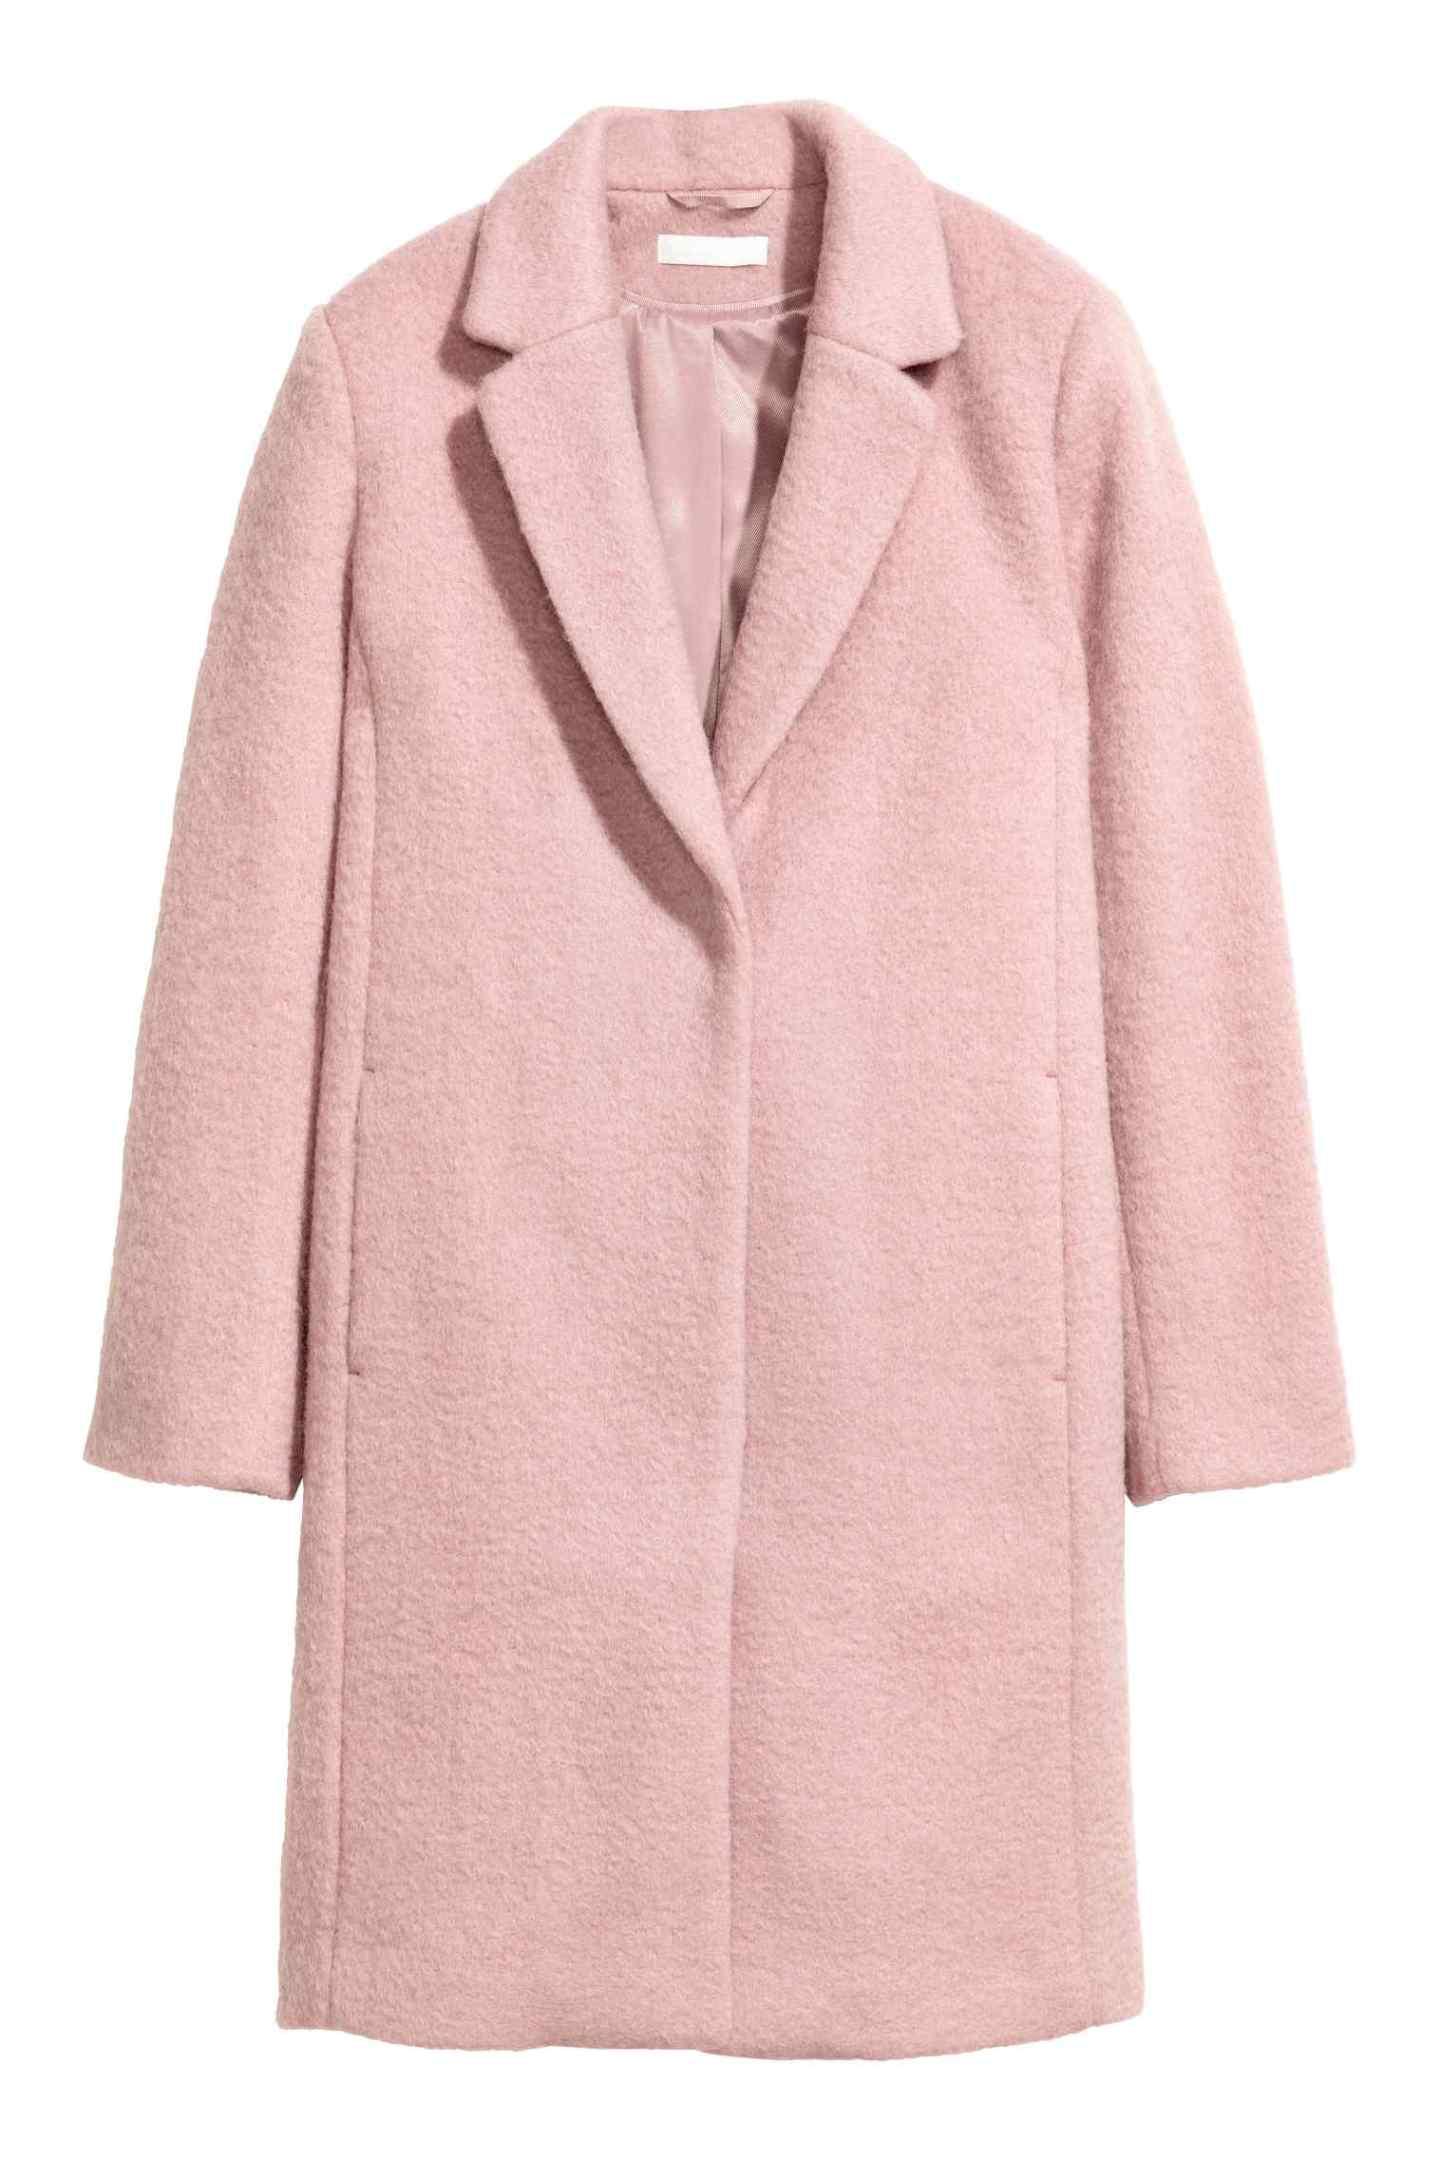 hm pink wool coat